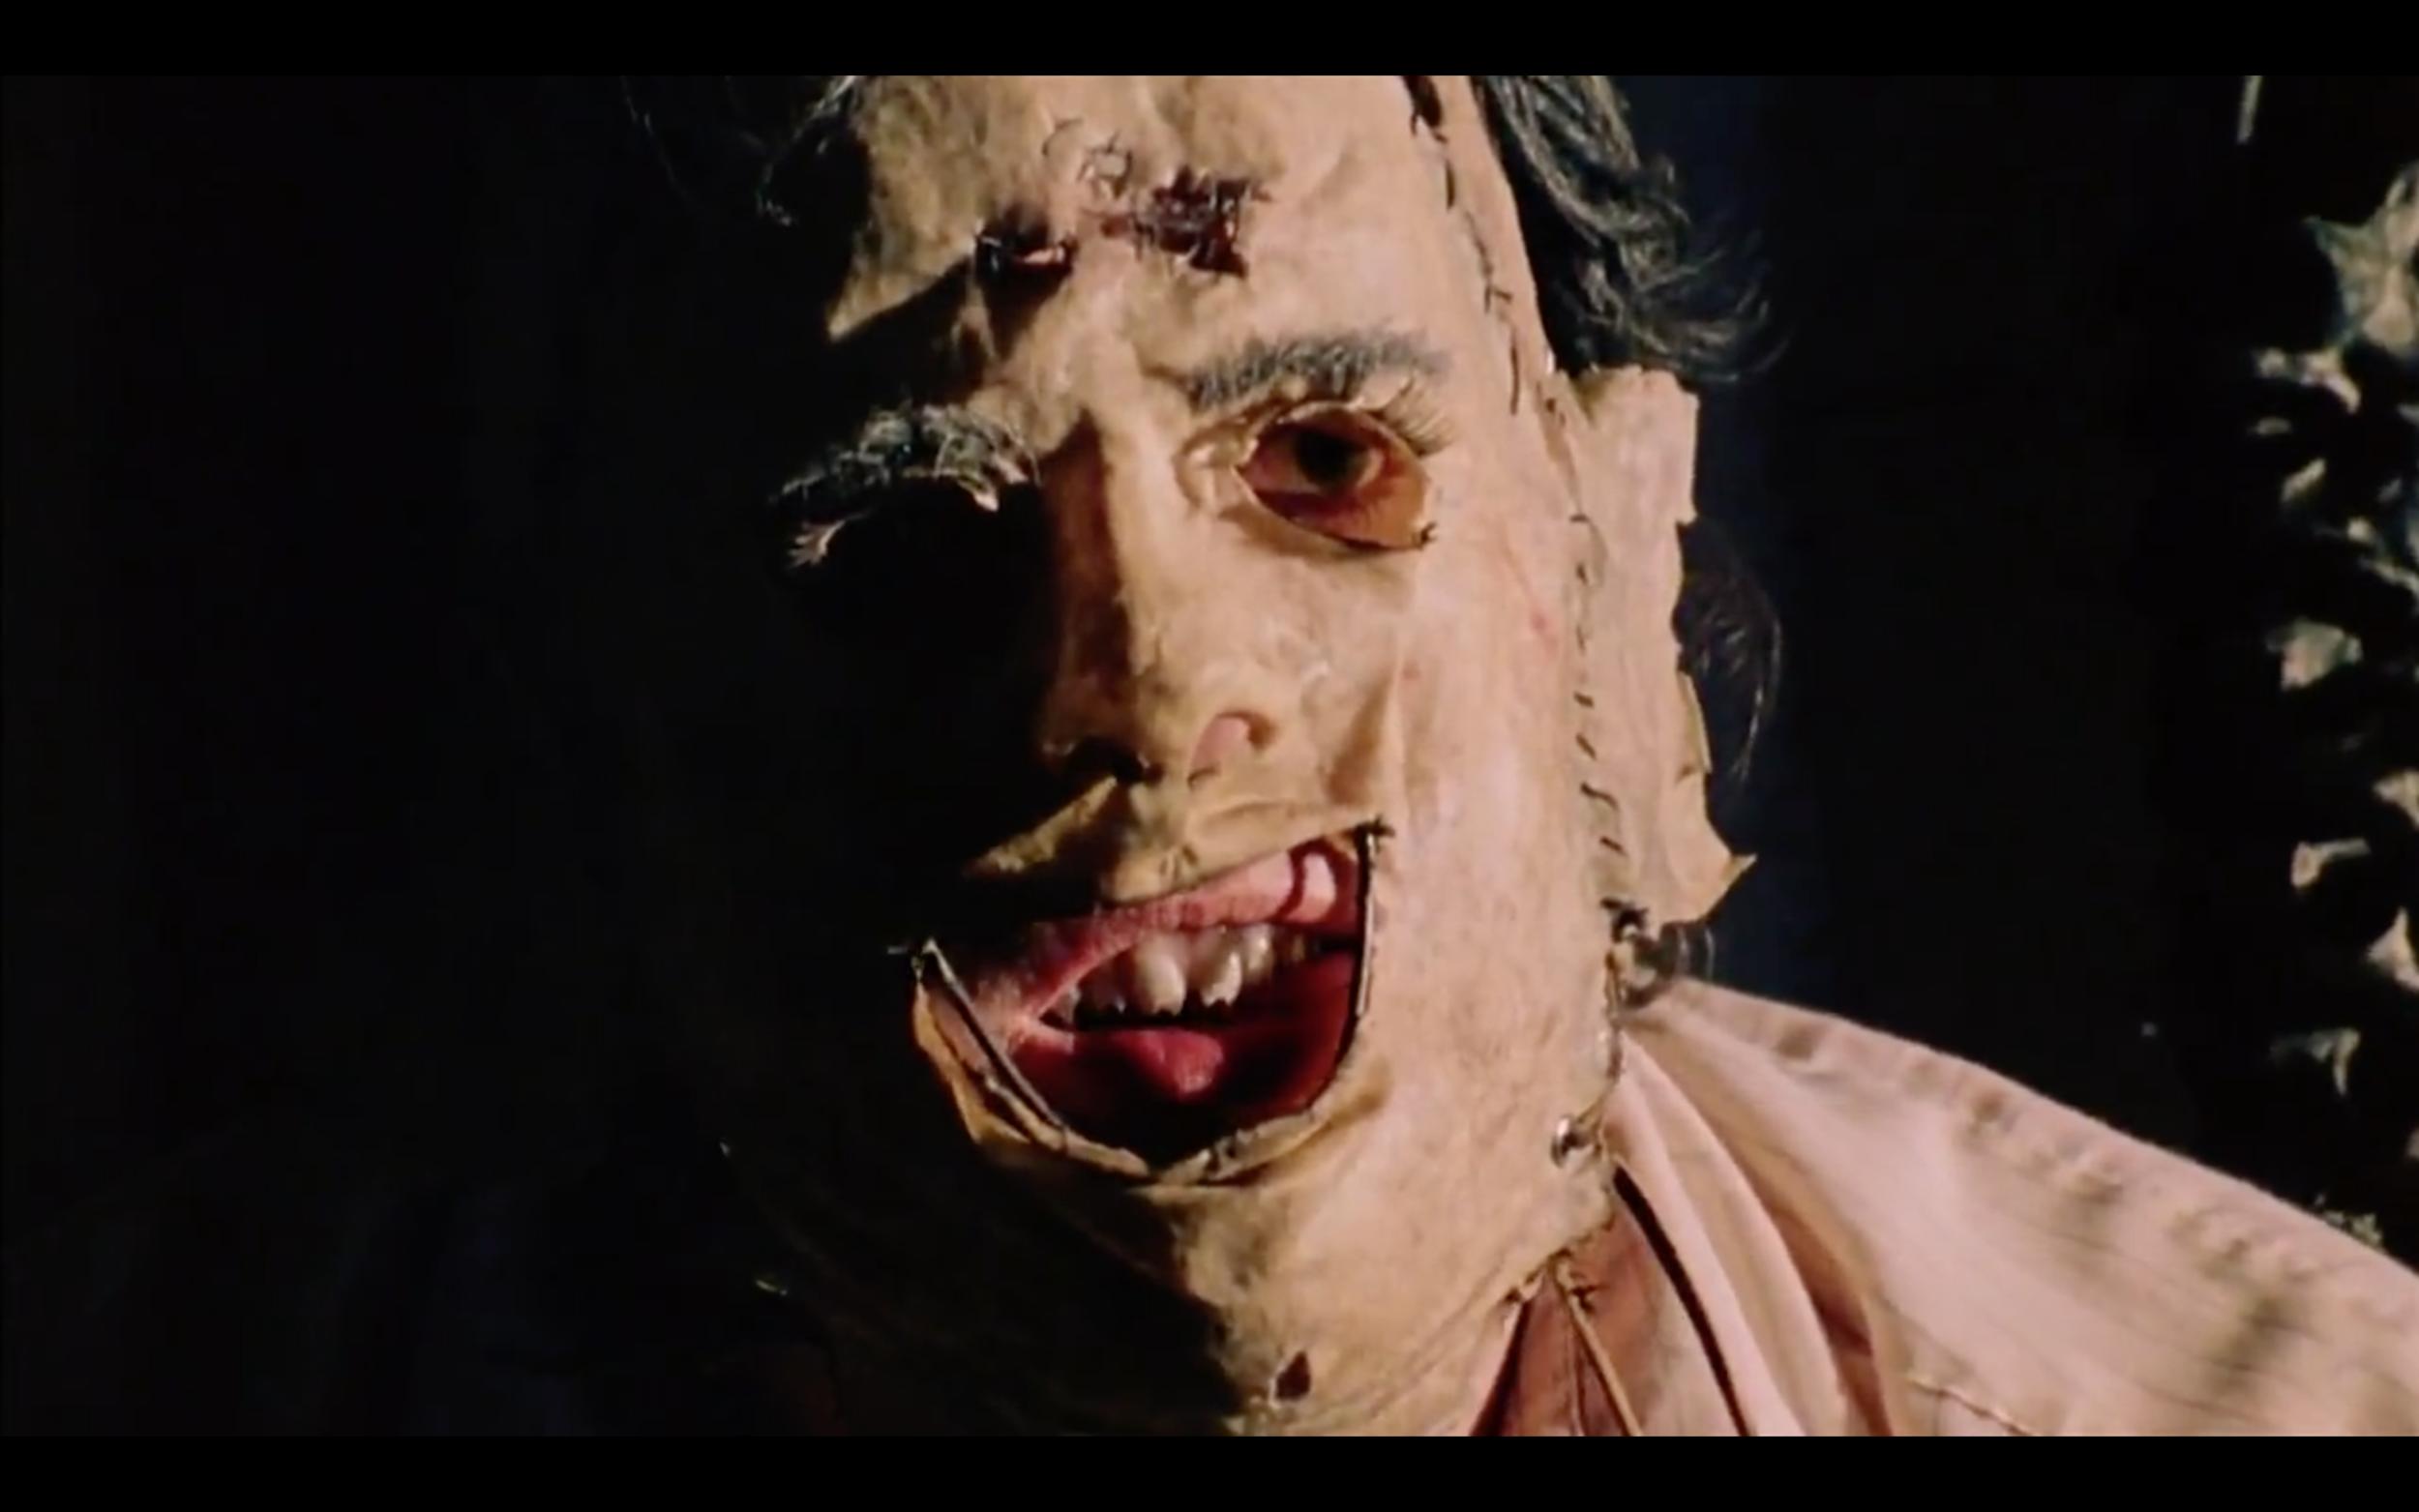 27. Hooper, Tobe, Director.  The Texas Chainsaw Massacre.  1974.